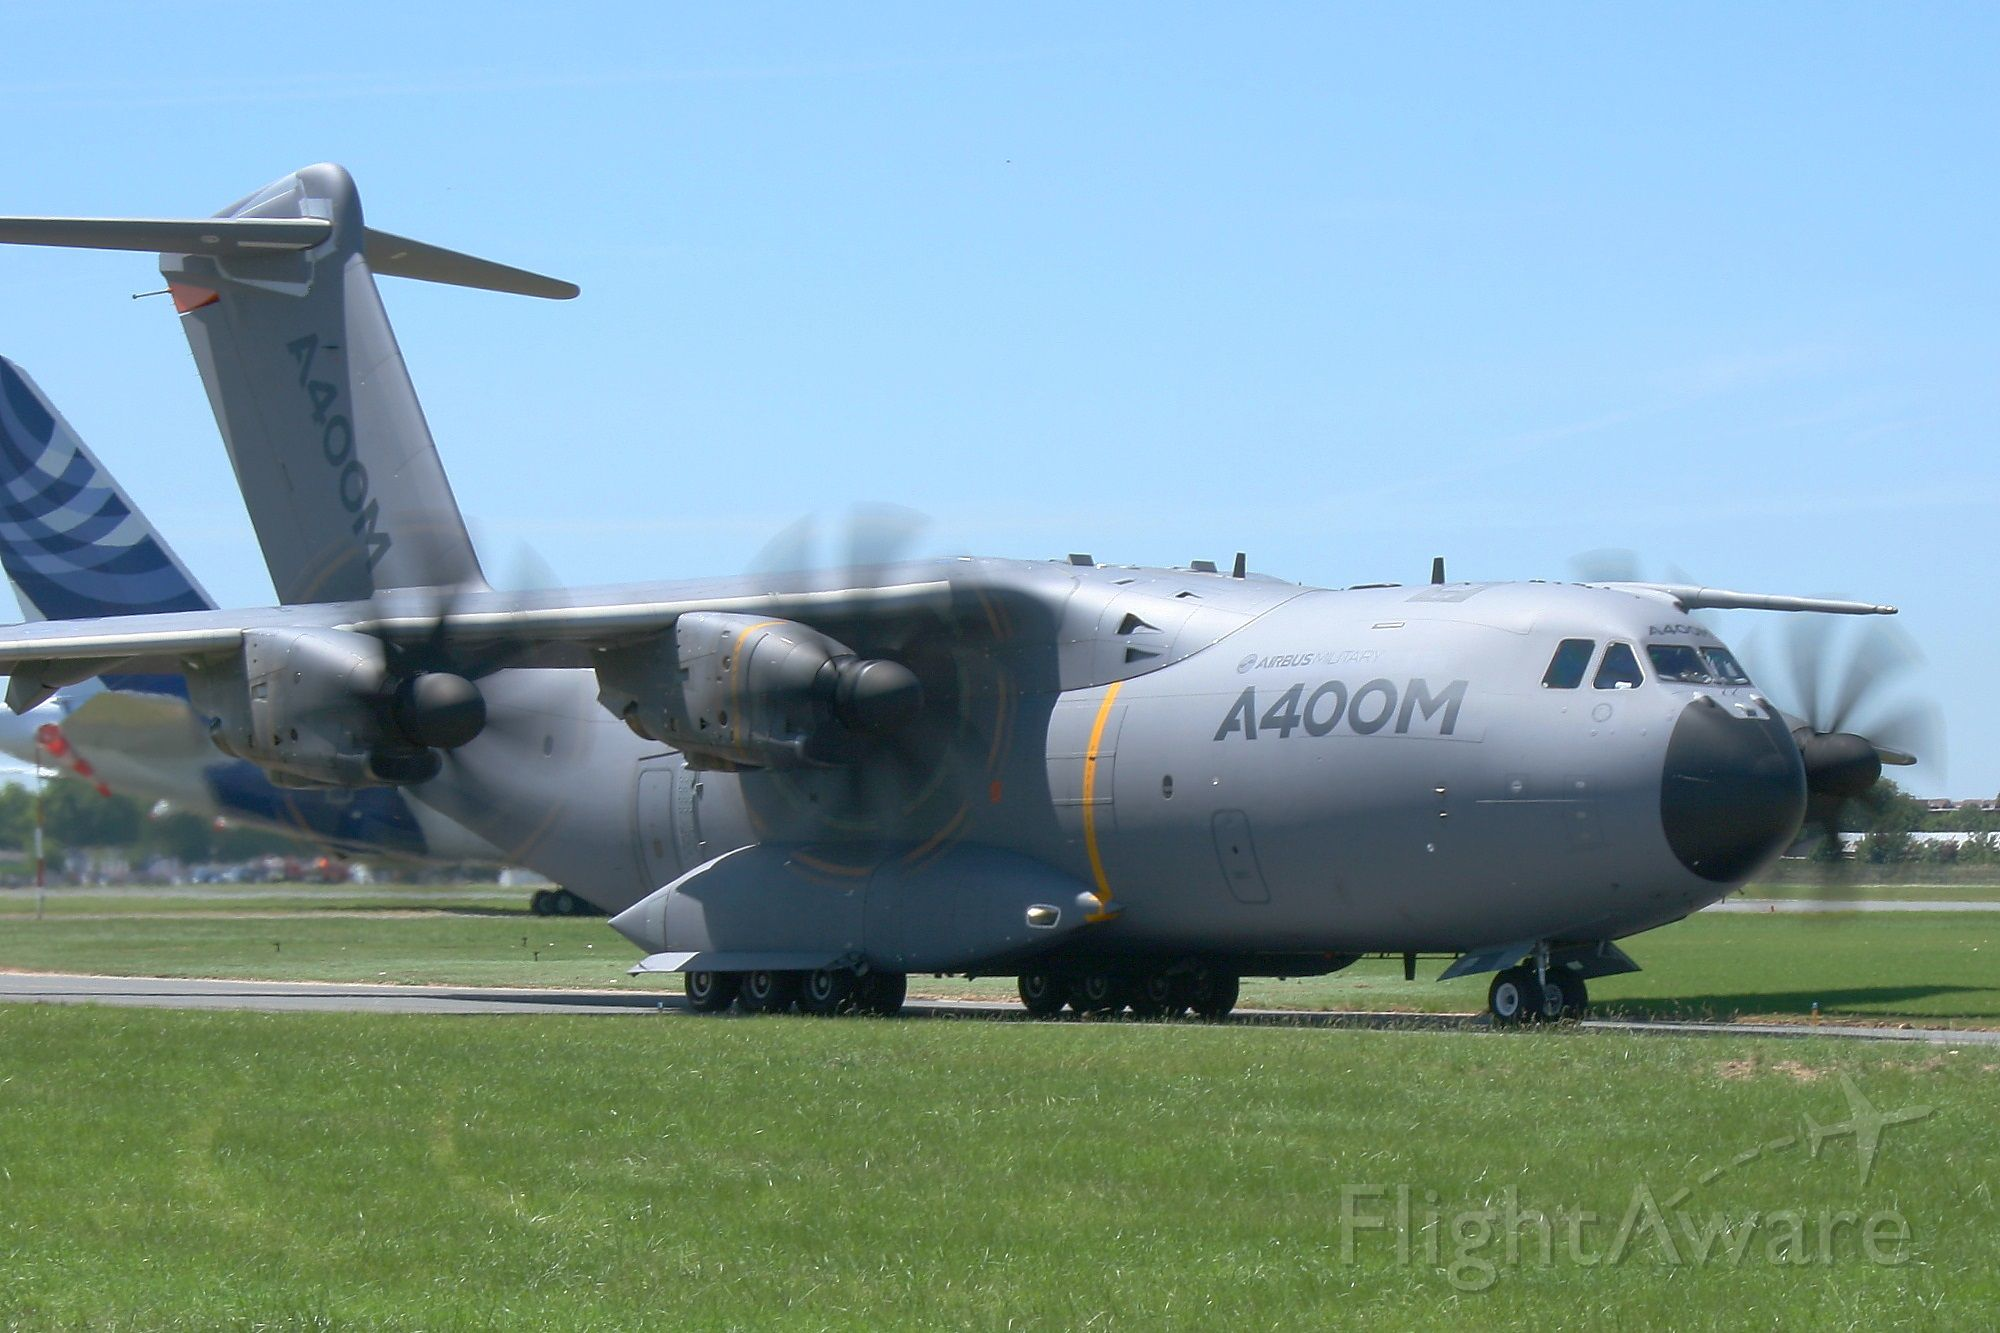 AIRBUS A-400M Atlas (F-WWMS) - Airbus Military A-400M Atlas-Grizzly, Paris Le Bourget (LFPB-LBG)